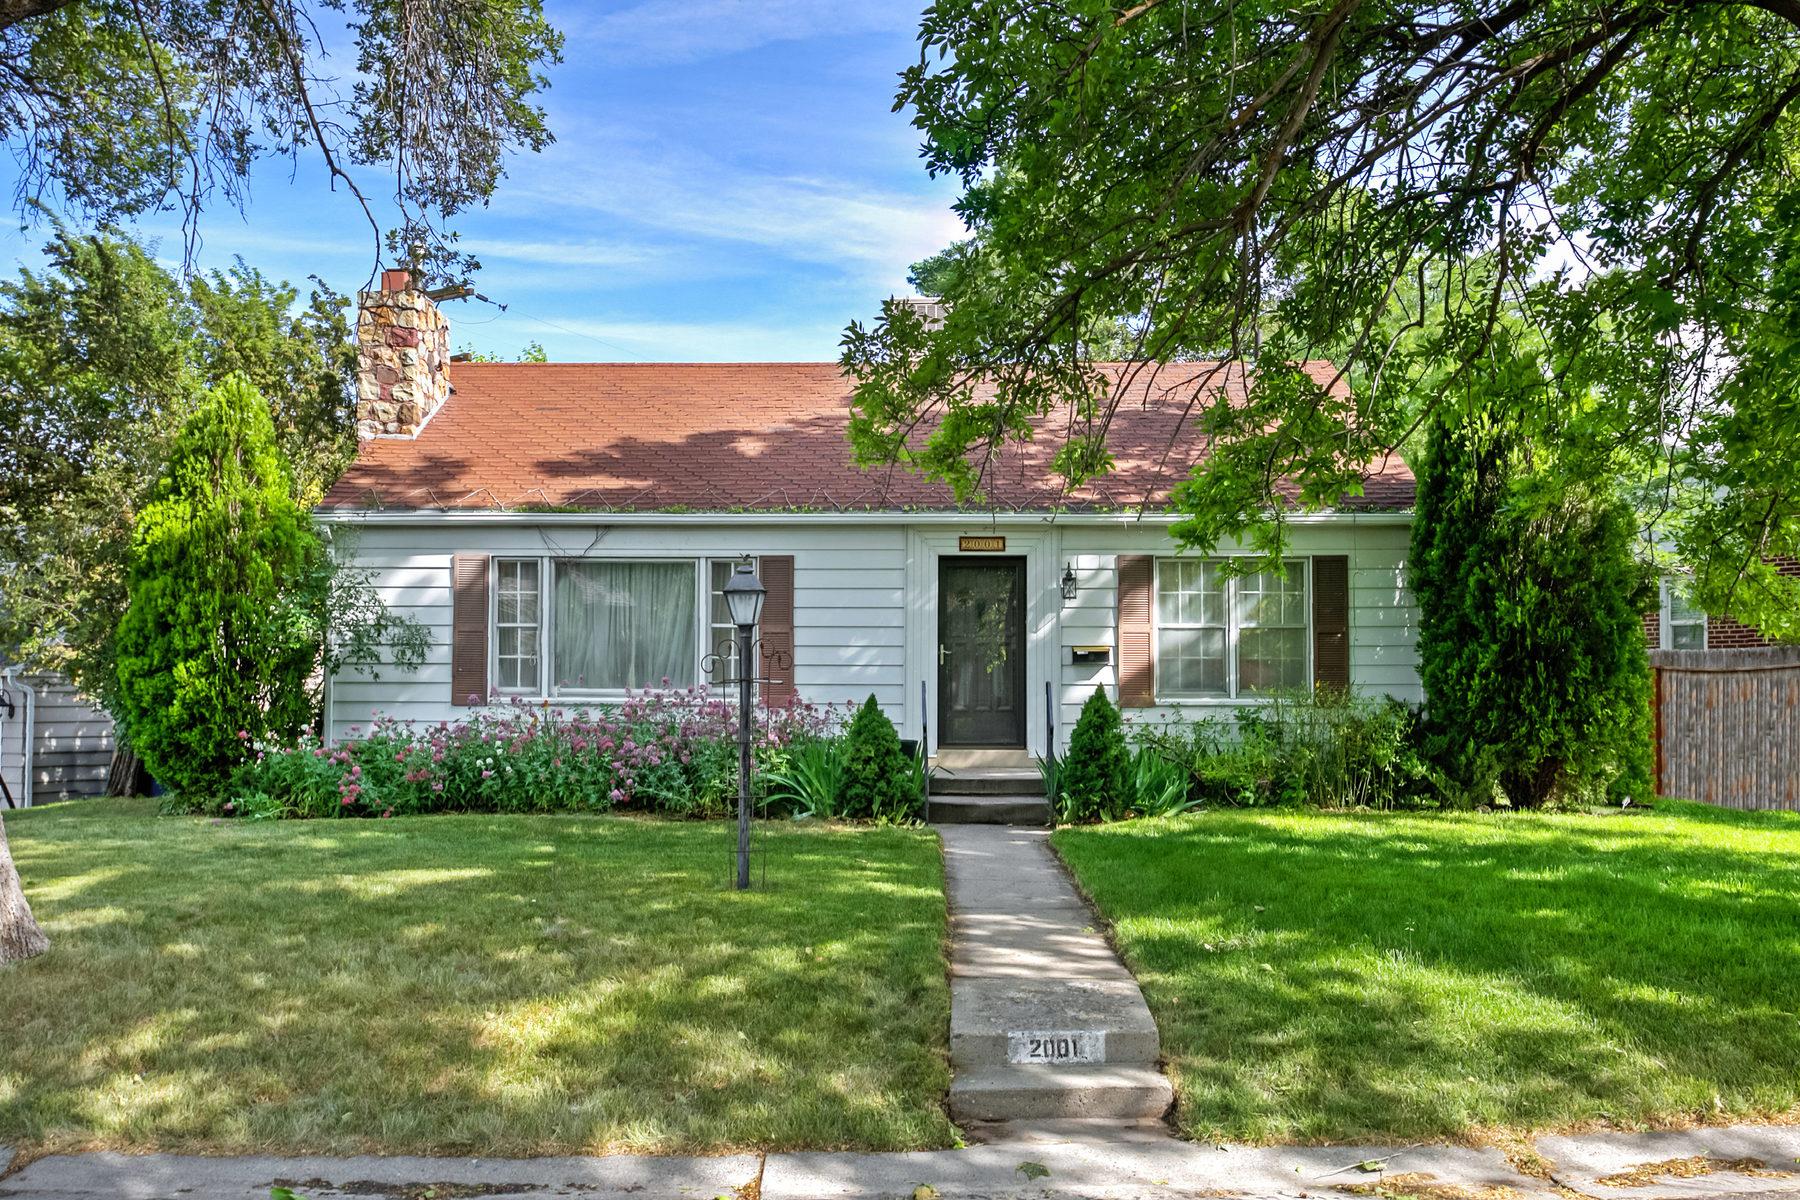 Villa per Vendita alle ore Amazing Remodel Opportunity 2001 E Sheridan Rd Salt Lake City, Utah, 84108 Stati Uniti